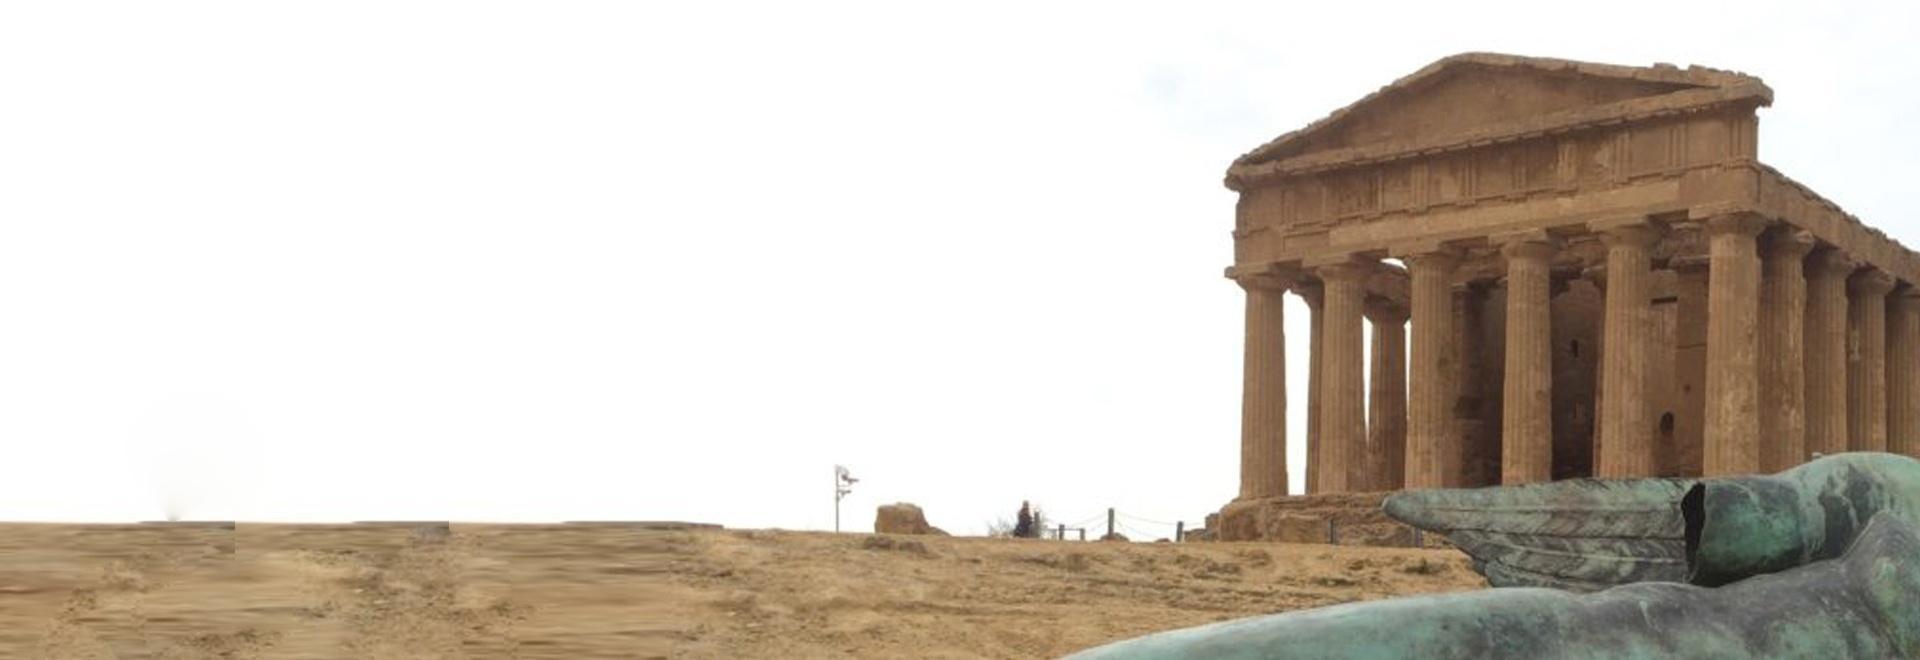 La Torre di Pisa